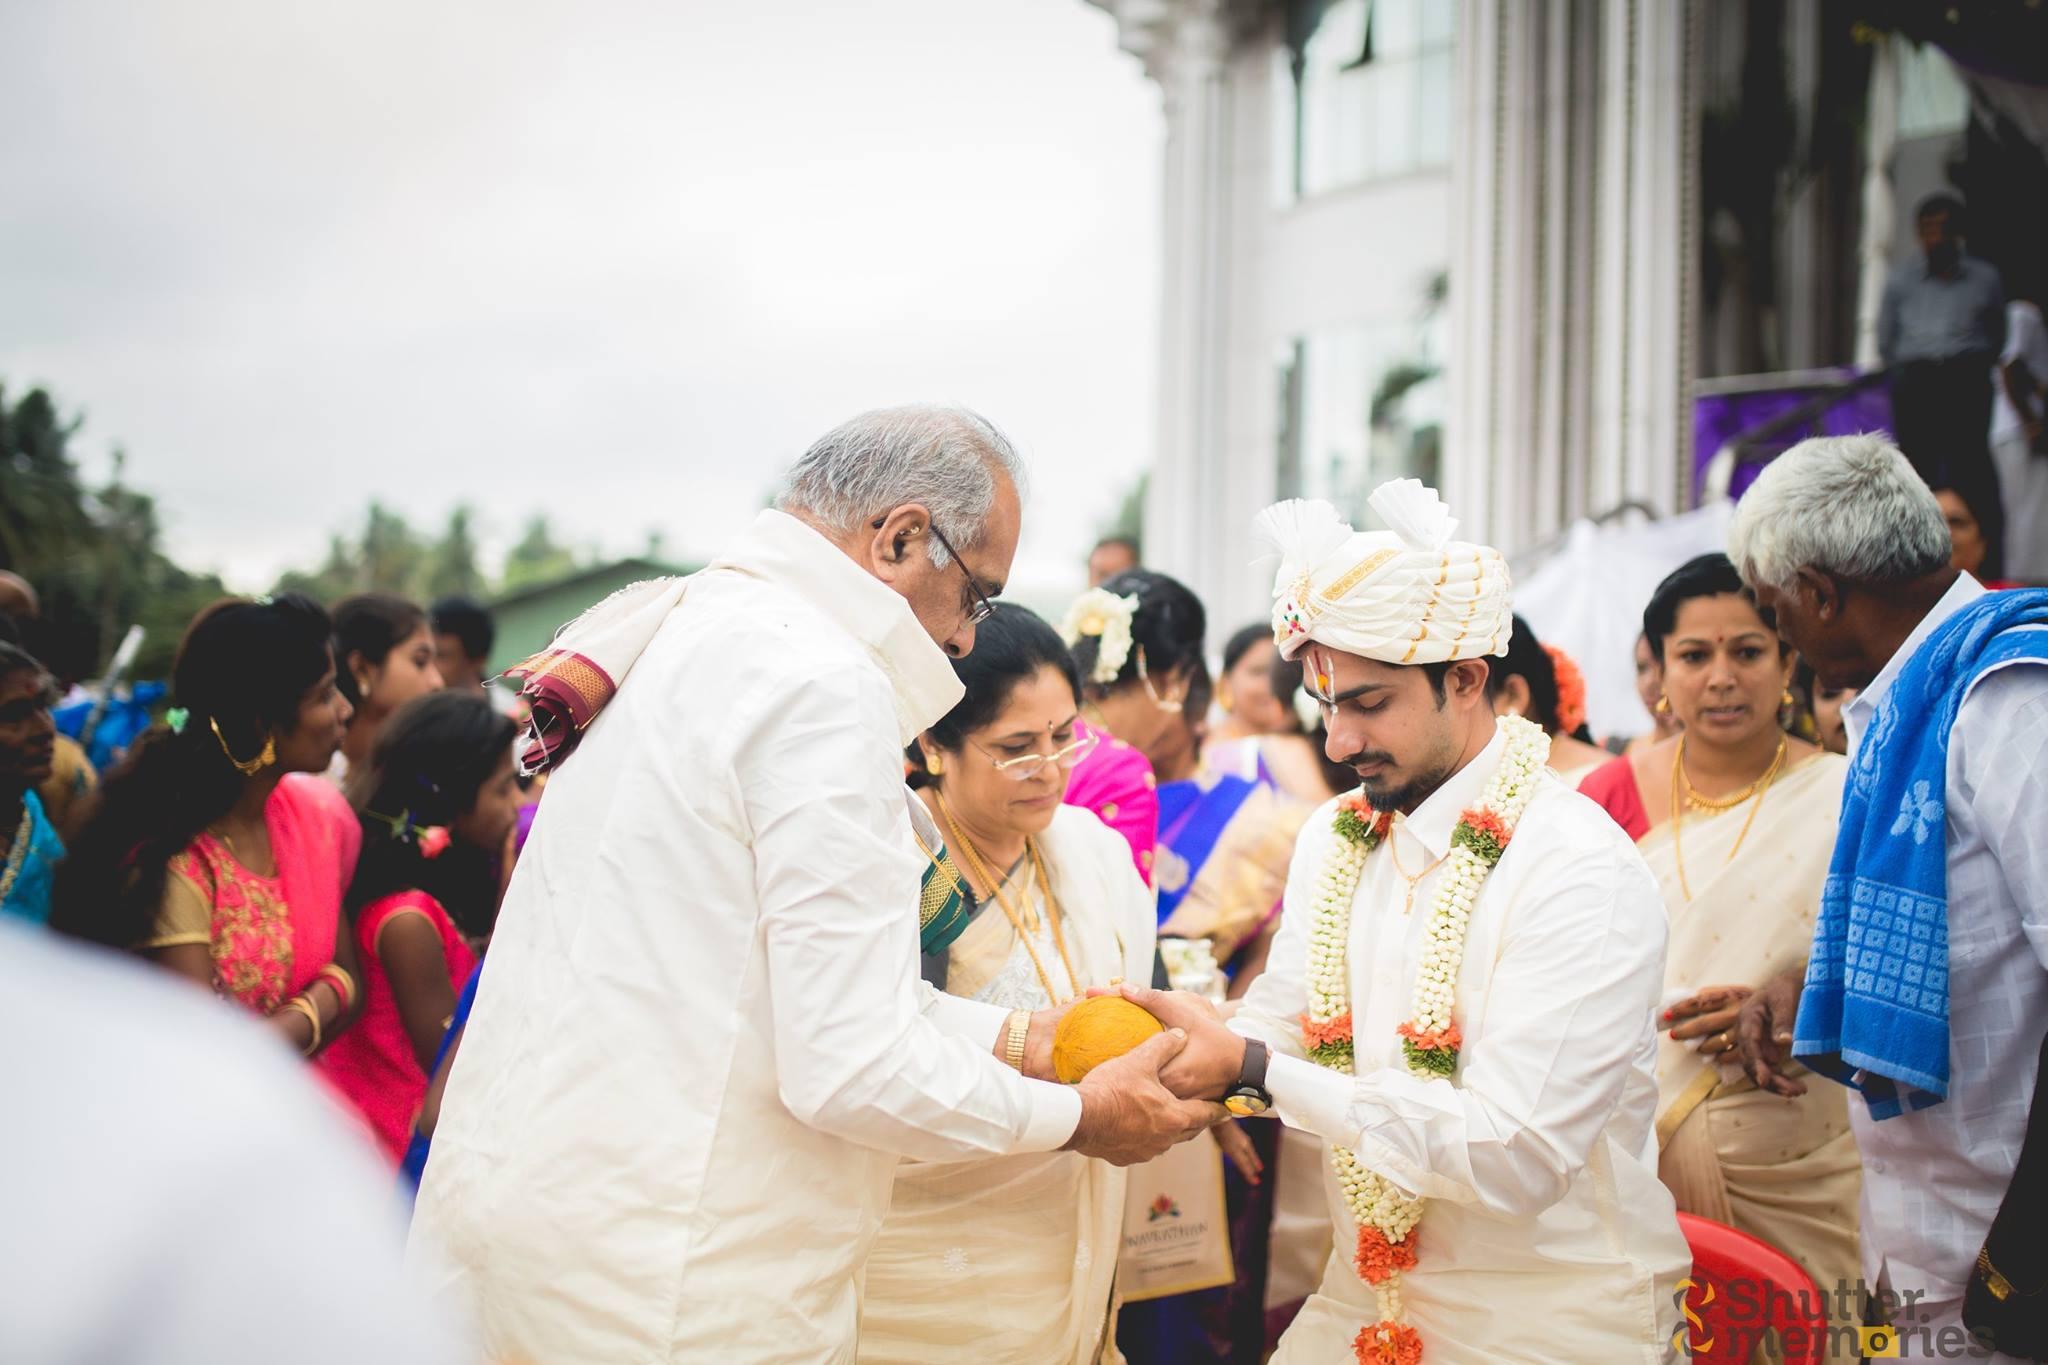 Harshi+Dilip | Real Wedding - Wedandbeyond.com